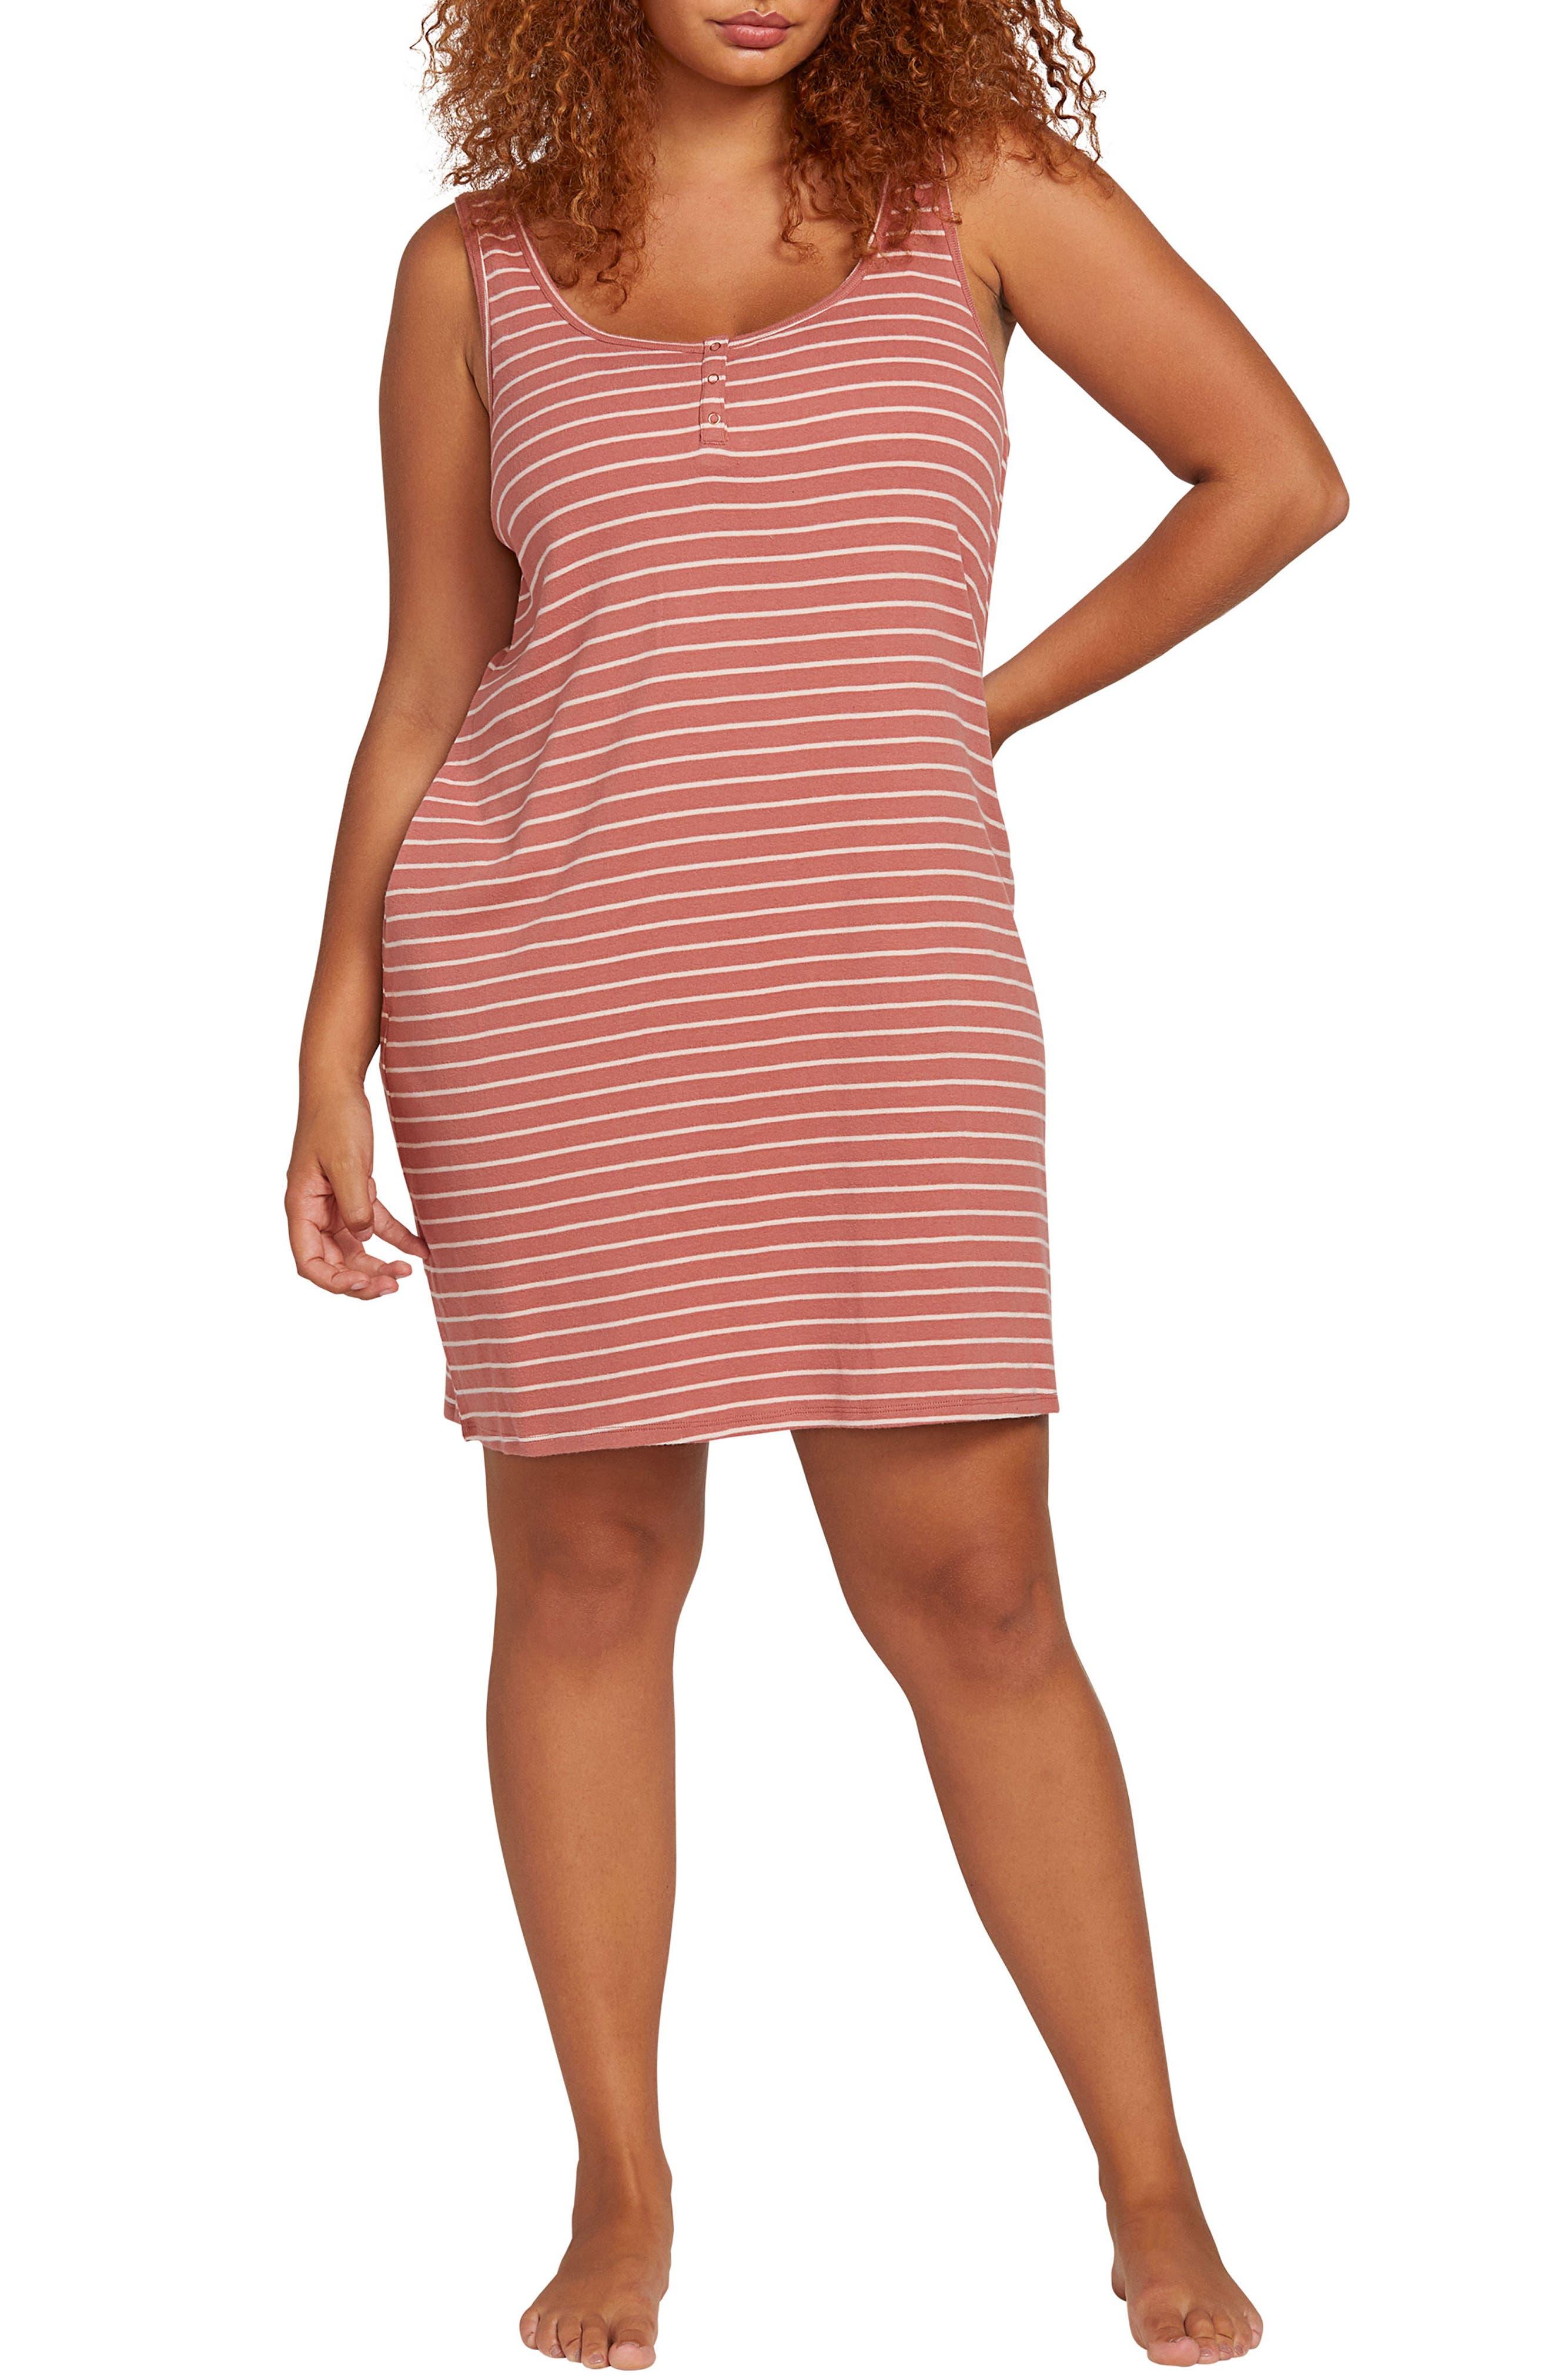 Plus Size Volcom Lil Stripe Minidress, Pink